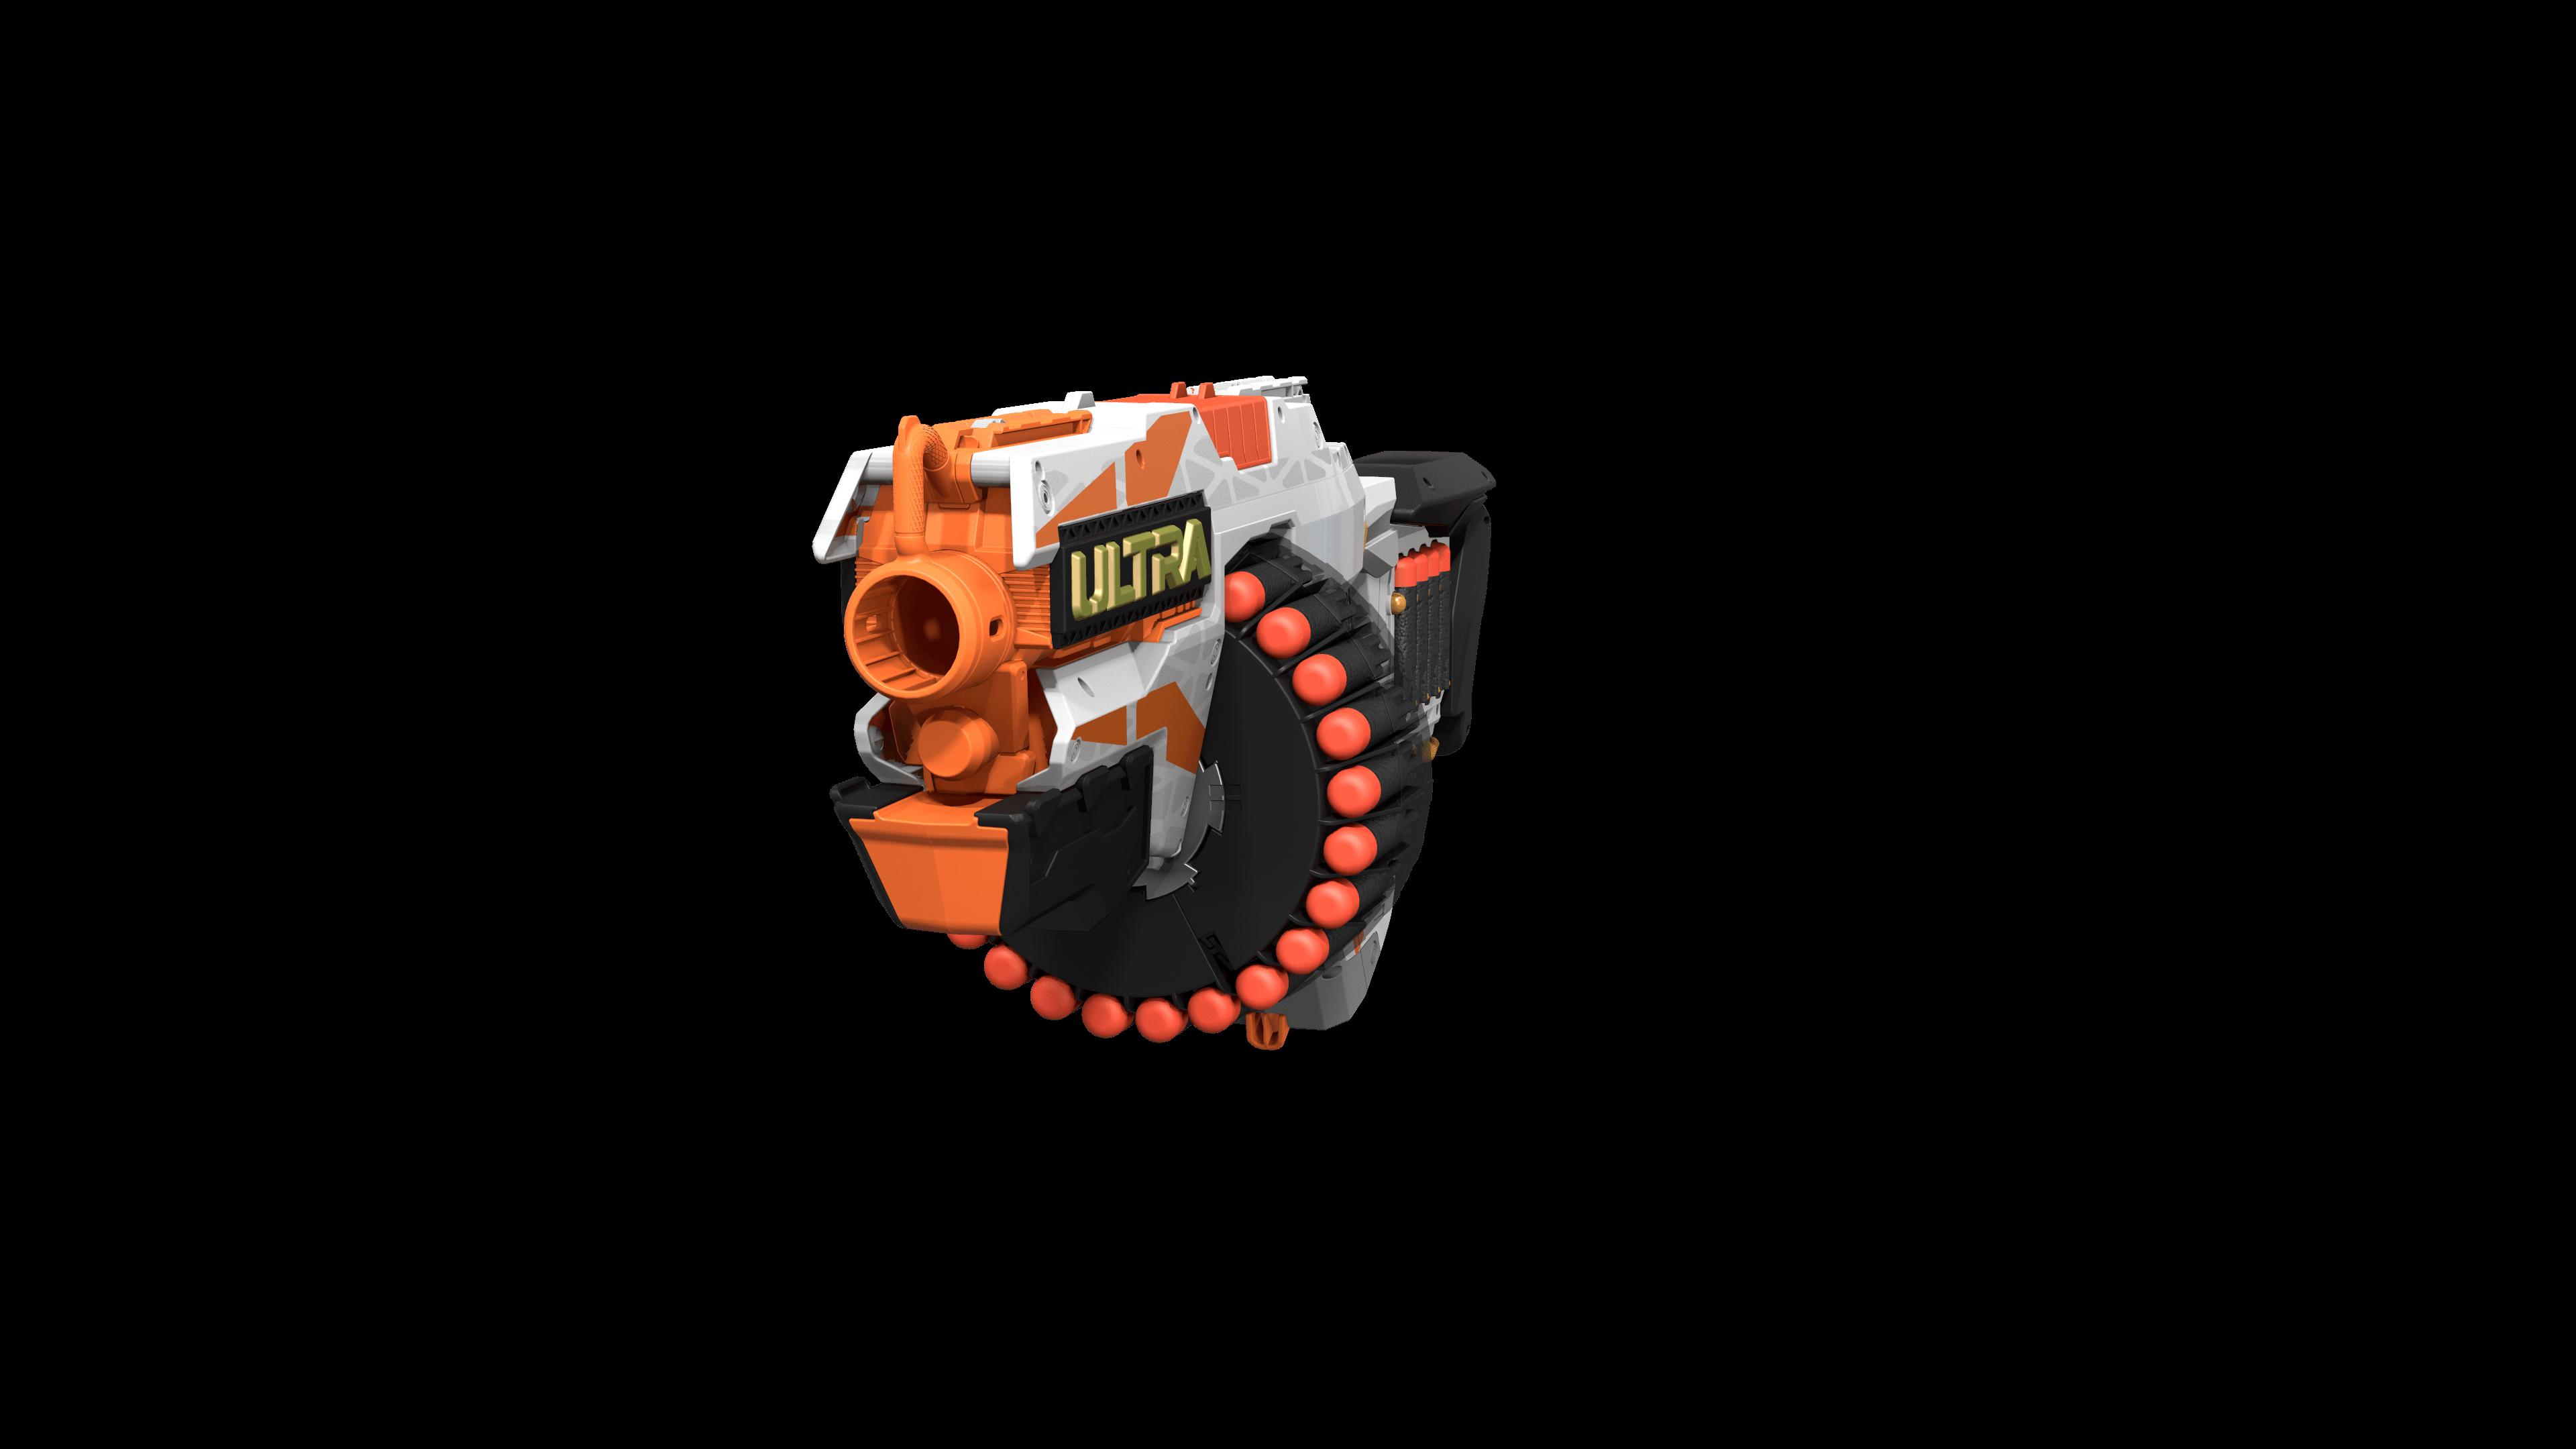 ultra blaster img 85